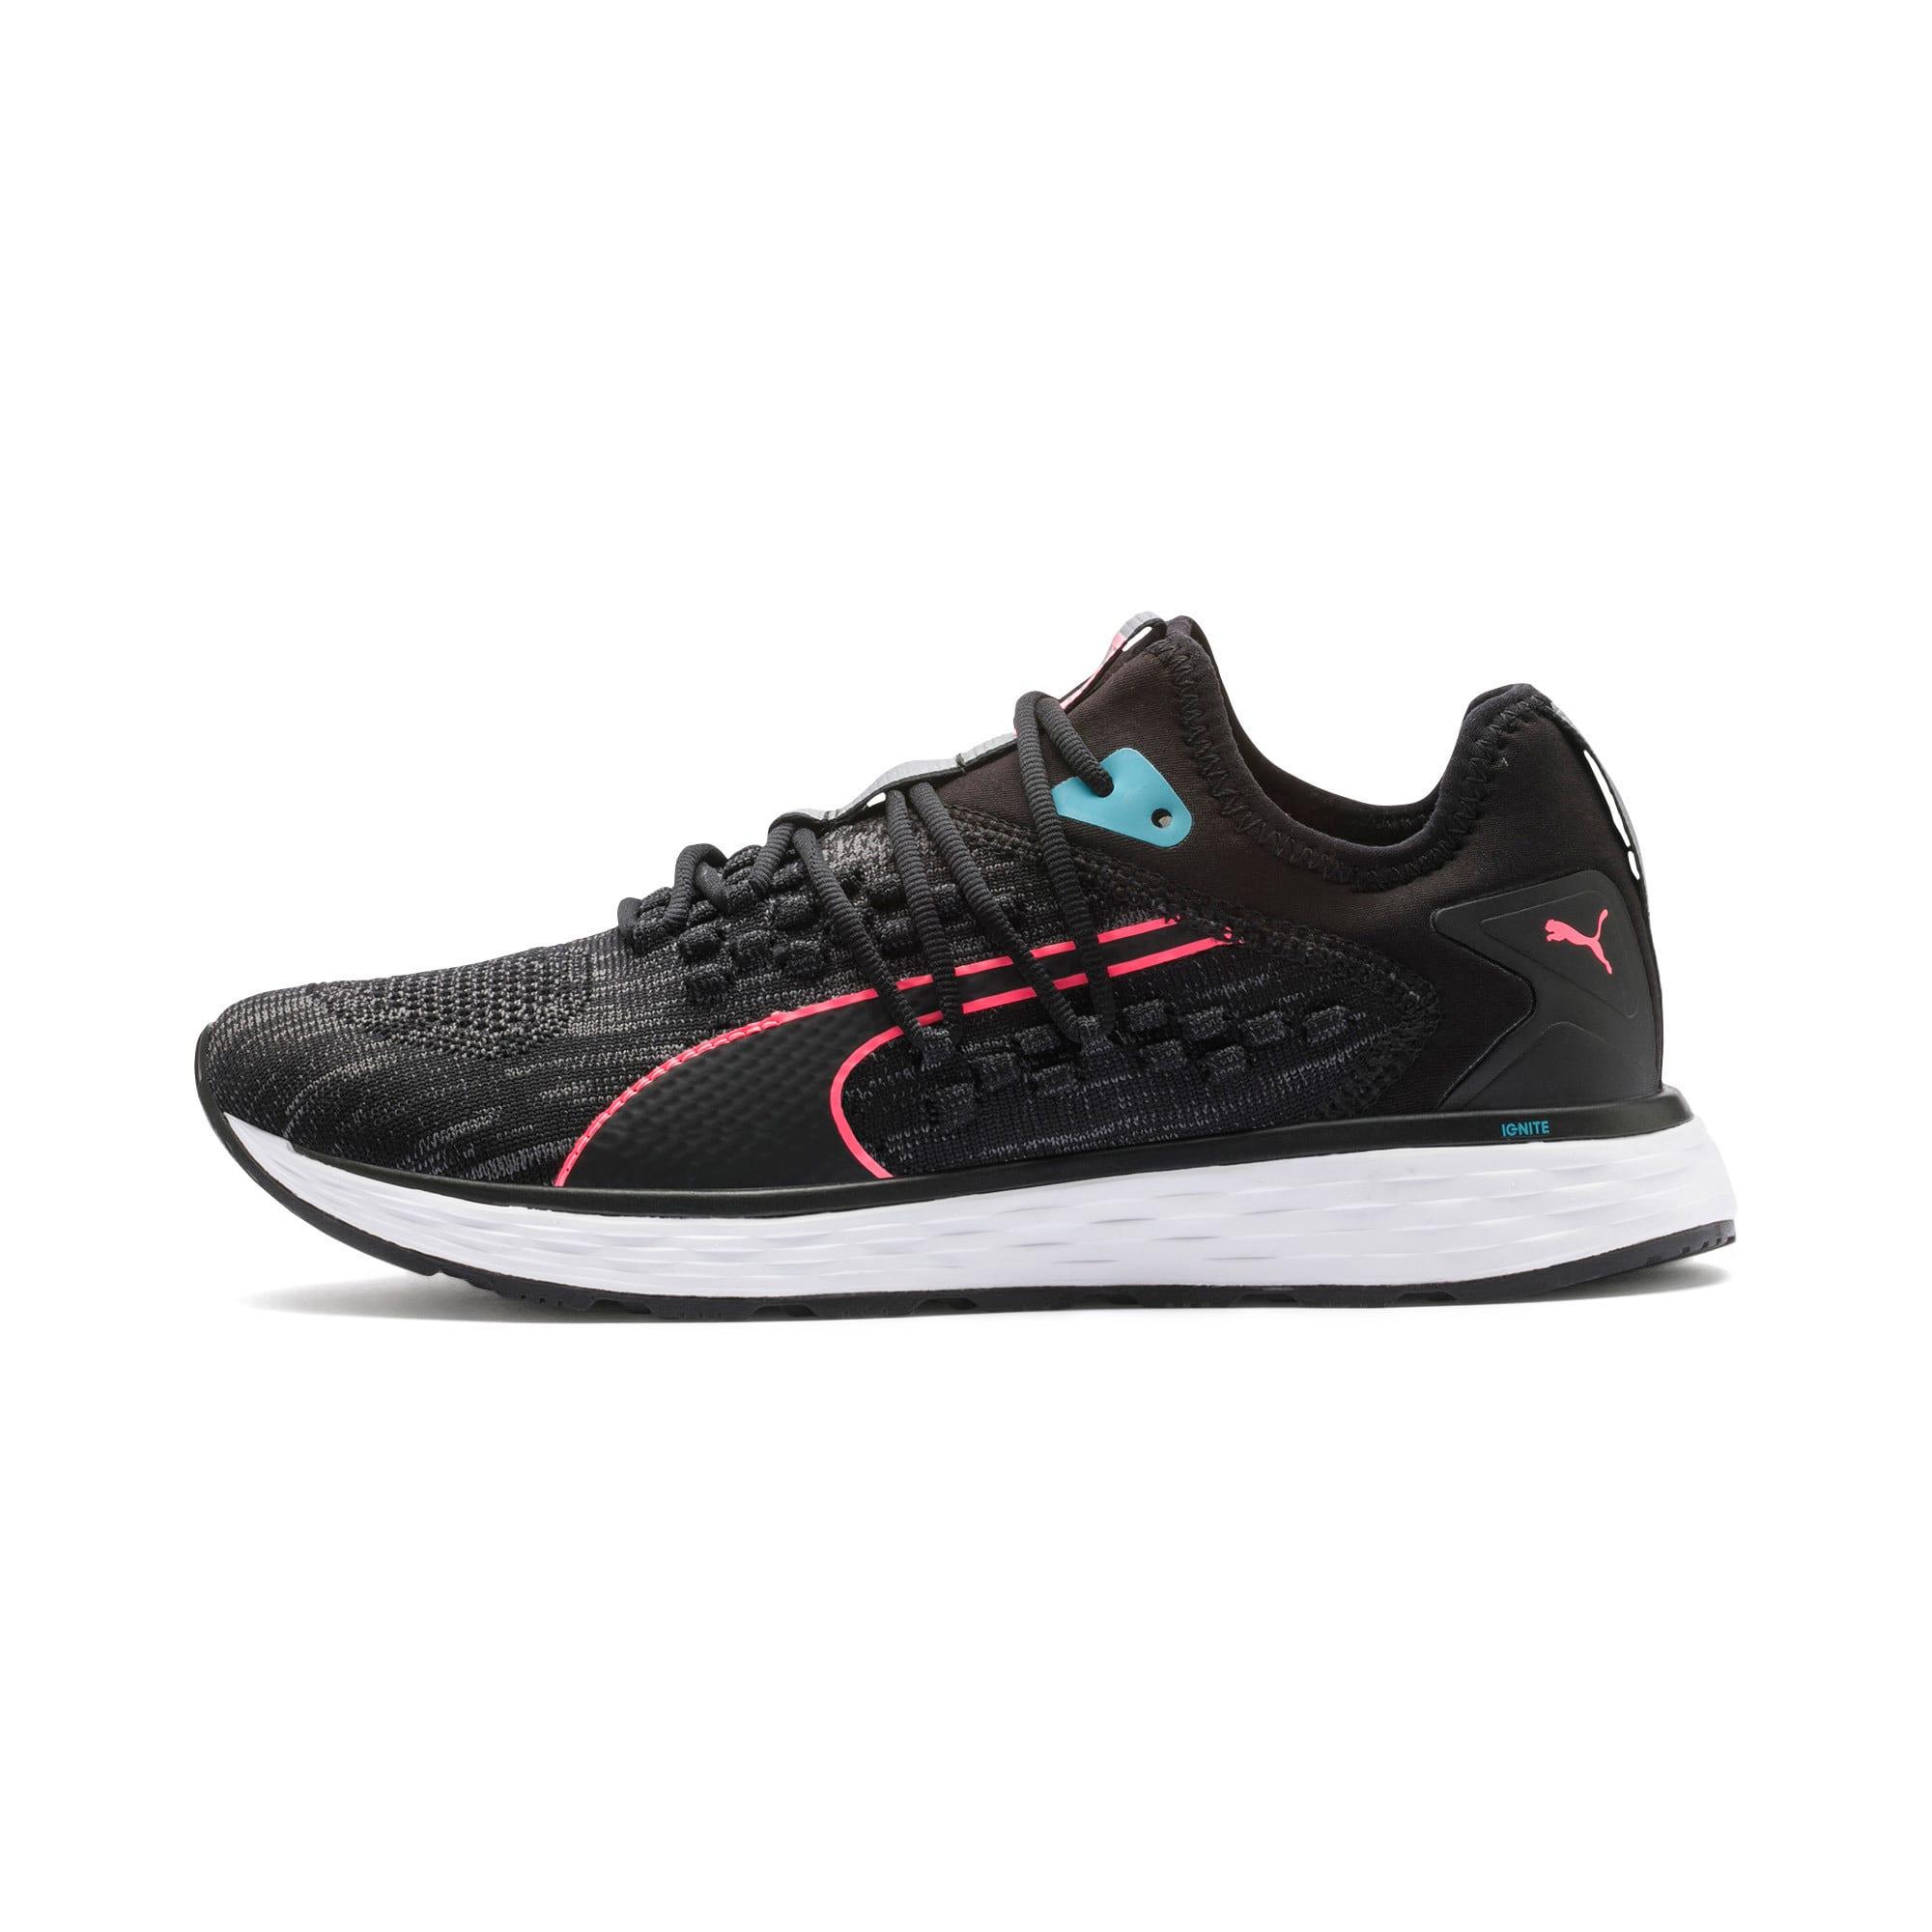 Thumbnail 1 of SPEED 600 FUSEFIT Women's Running Shoes, Puma Black-Milky Blue, medium